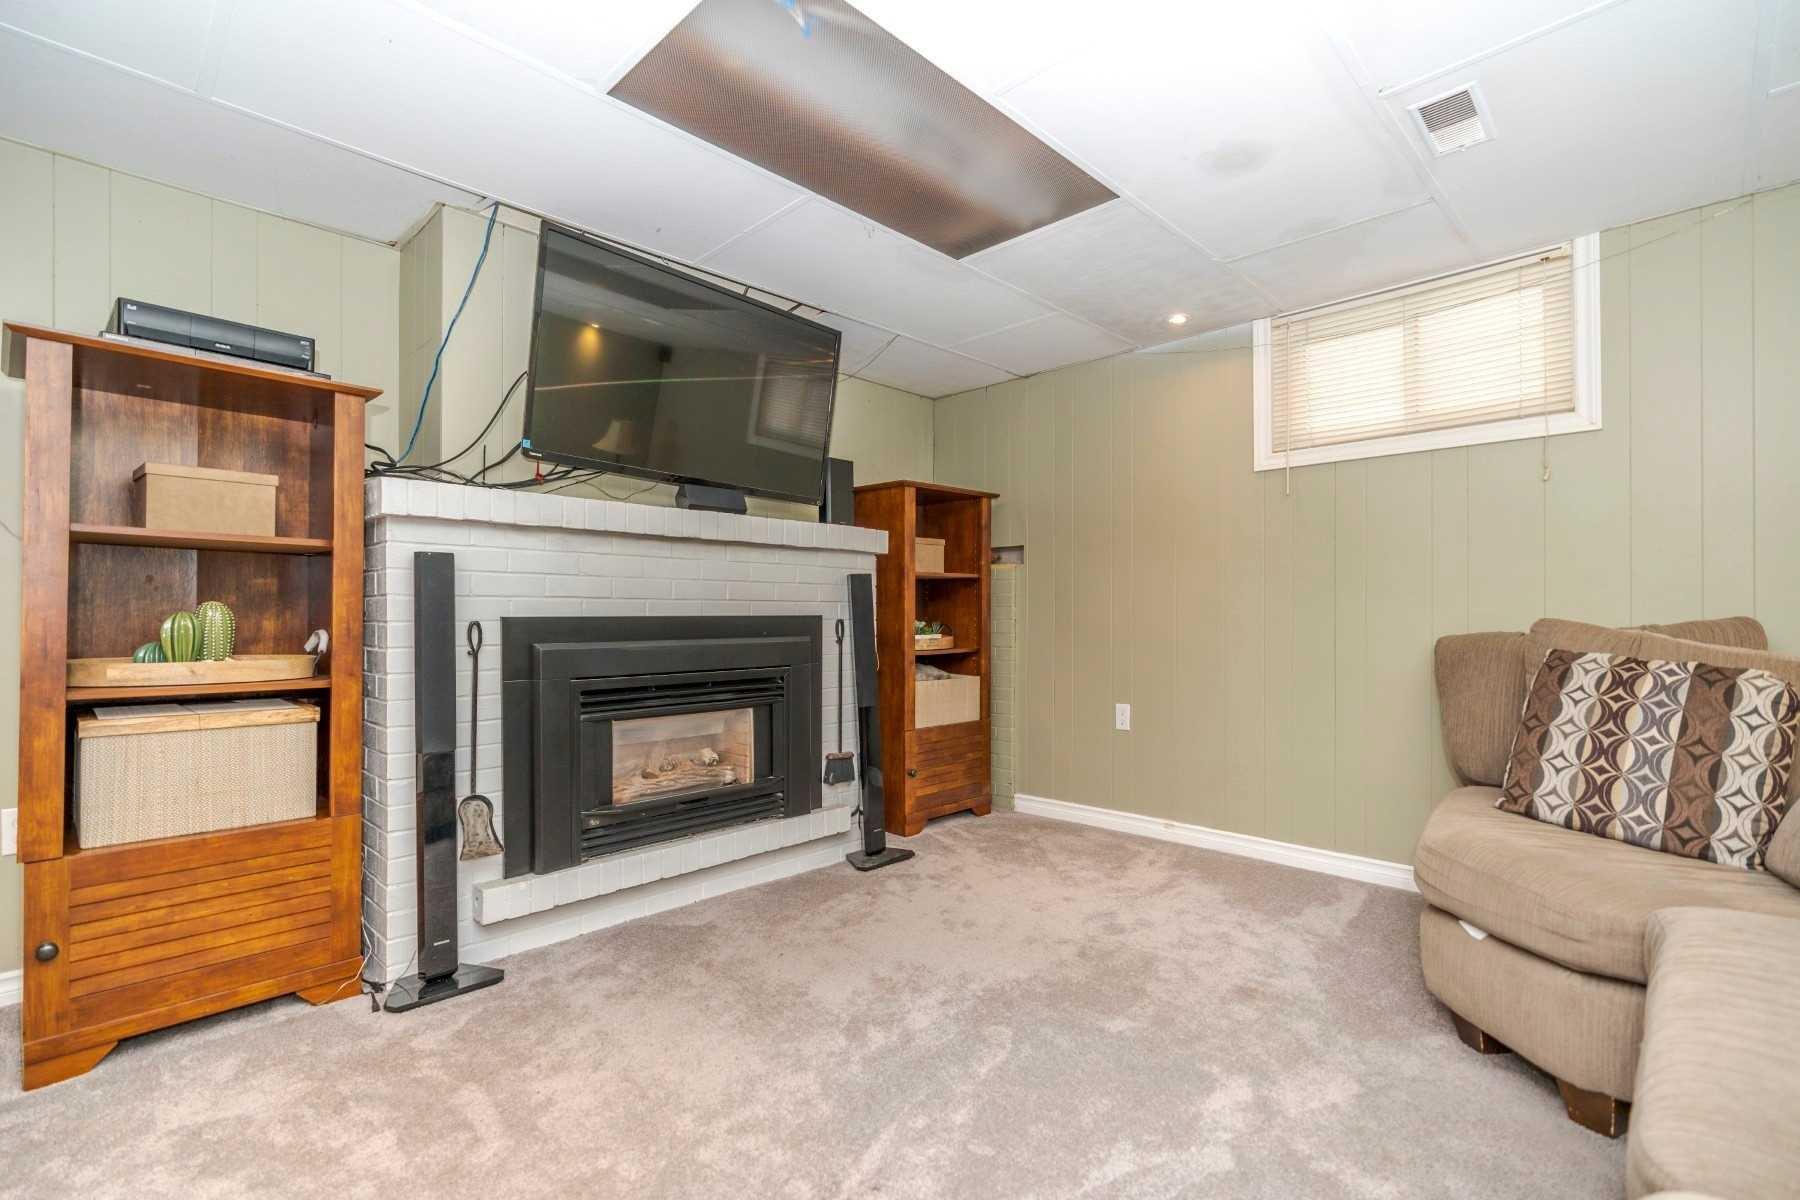 Photo 15: Photos: 190 N Church Street in Clarington: Orono House (Sidesplit 4) for sale : MLS®# E4463047